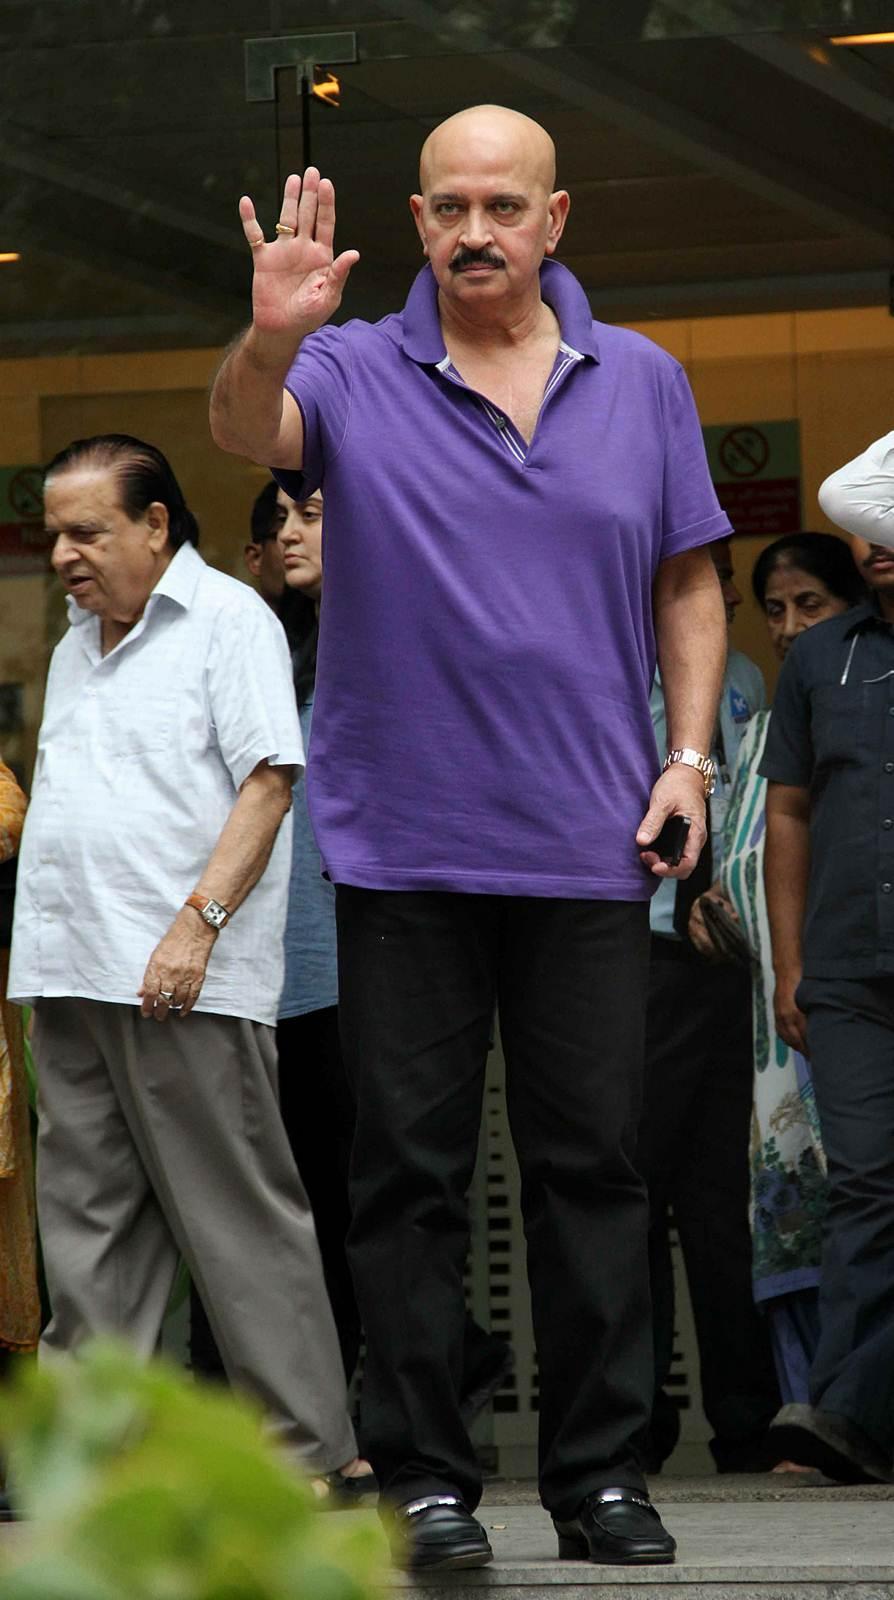 Rakesh Roshan - Celebs to meet Hirthik Roshan after brain surgery Photos | Picture 504142